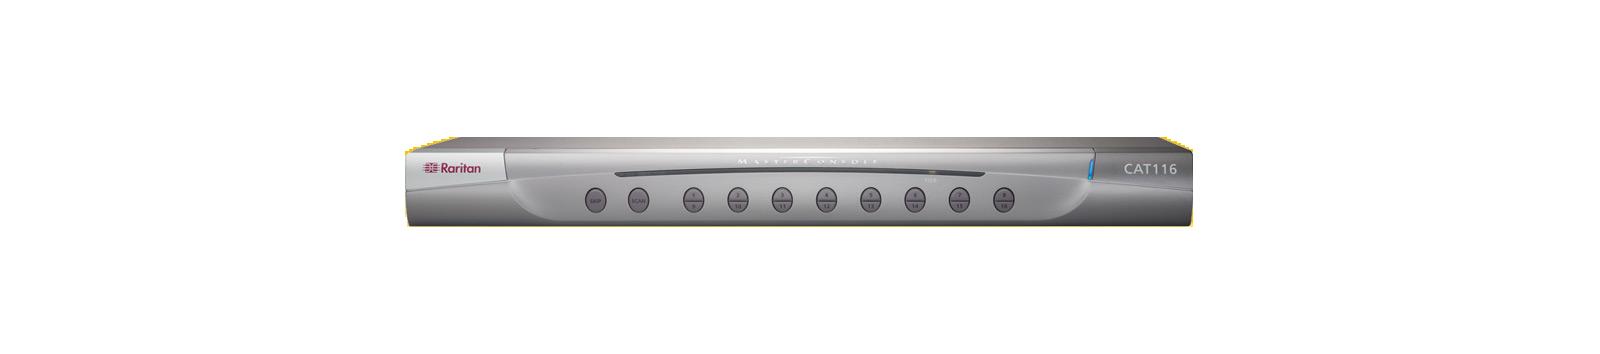 Raritan D2cim-Vusb VGA RJ45 AV Video Modual